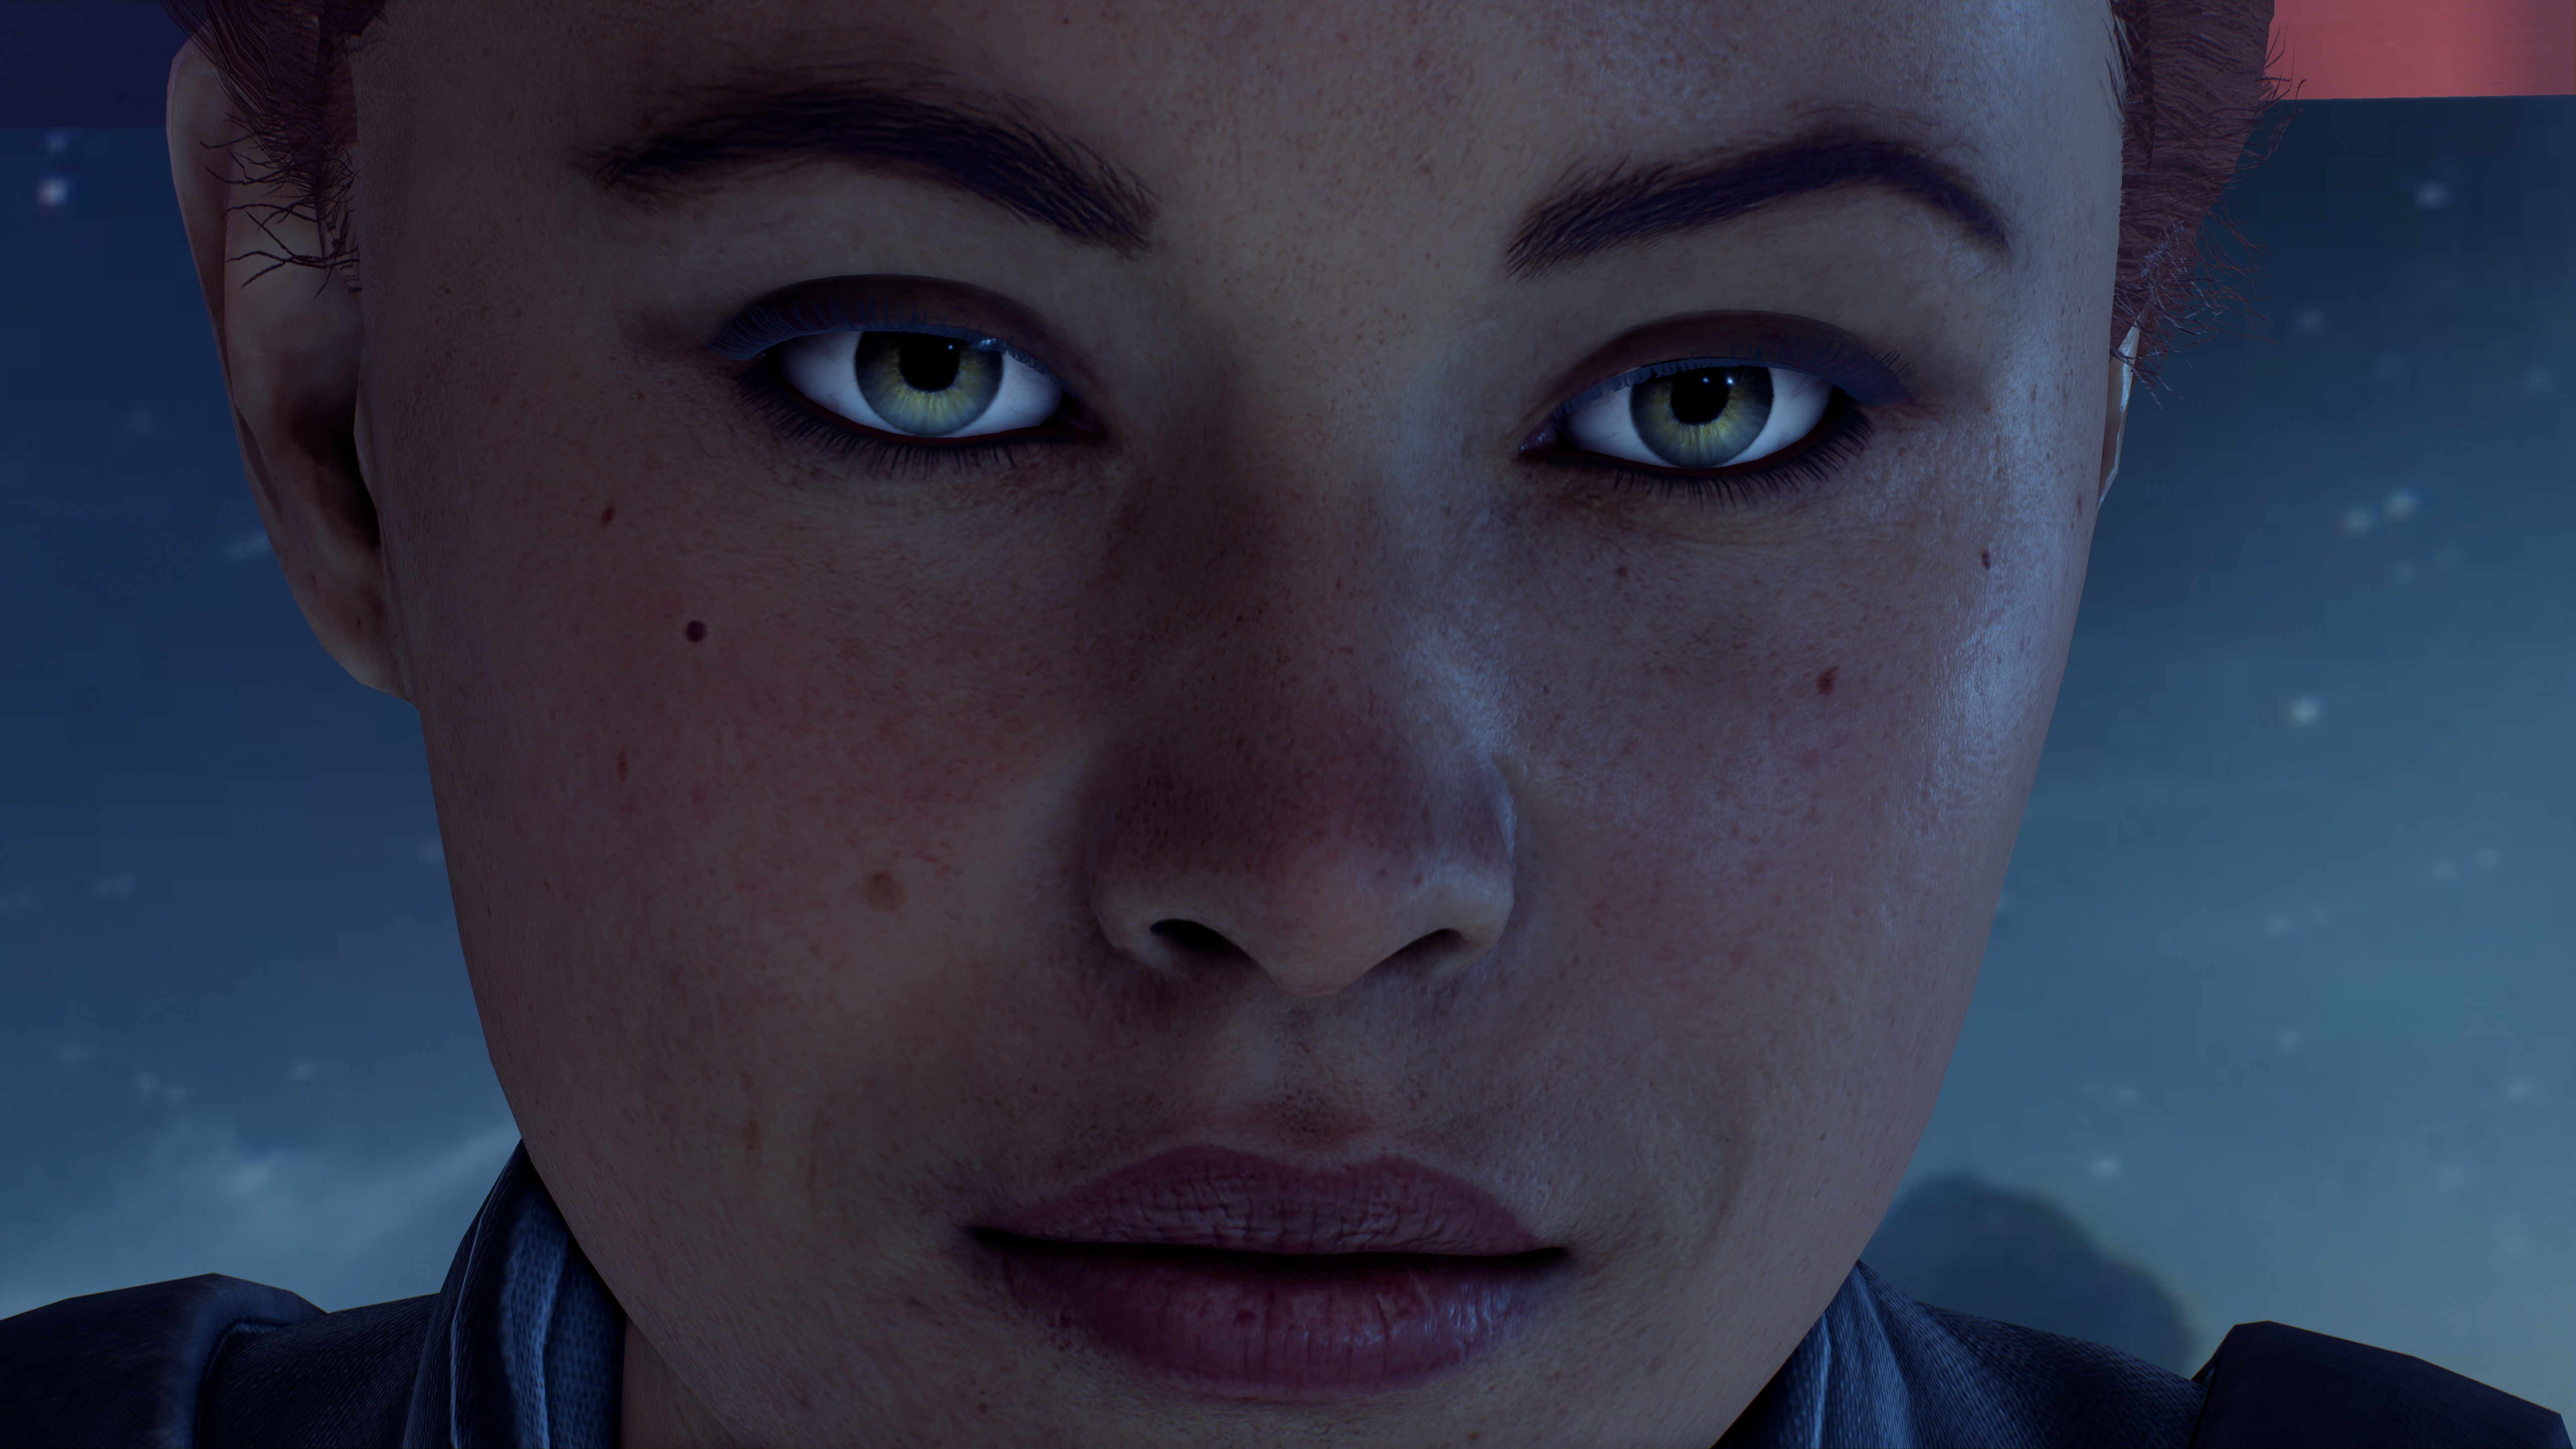 Mass Effect Andromeda Super-Resolution 2017.10.05 - 18.52.08.50.jpg - Mass Effect: Andromeda